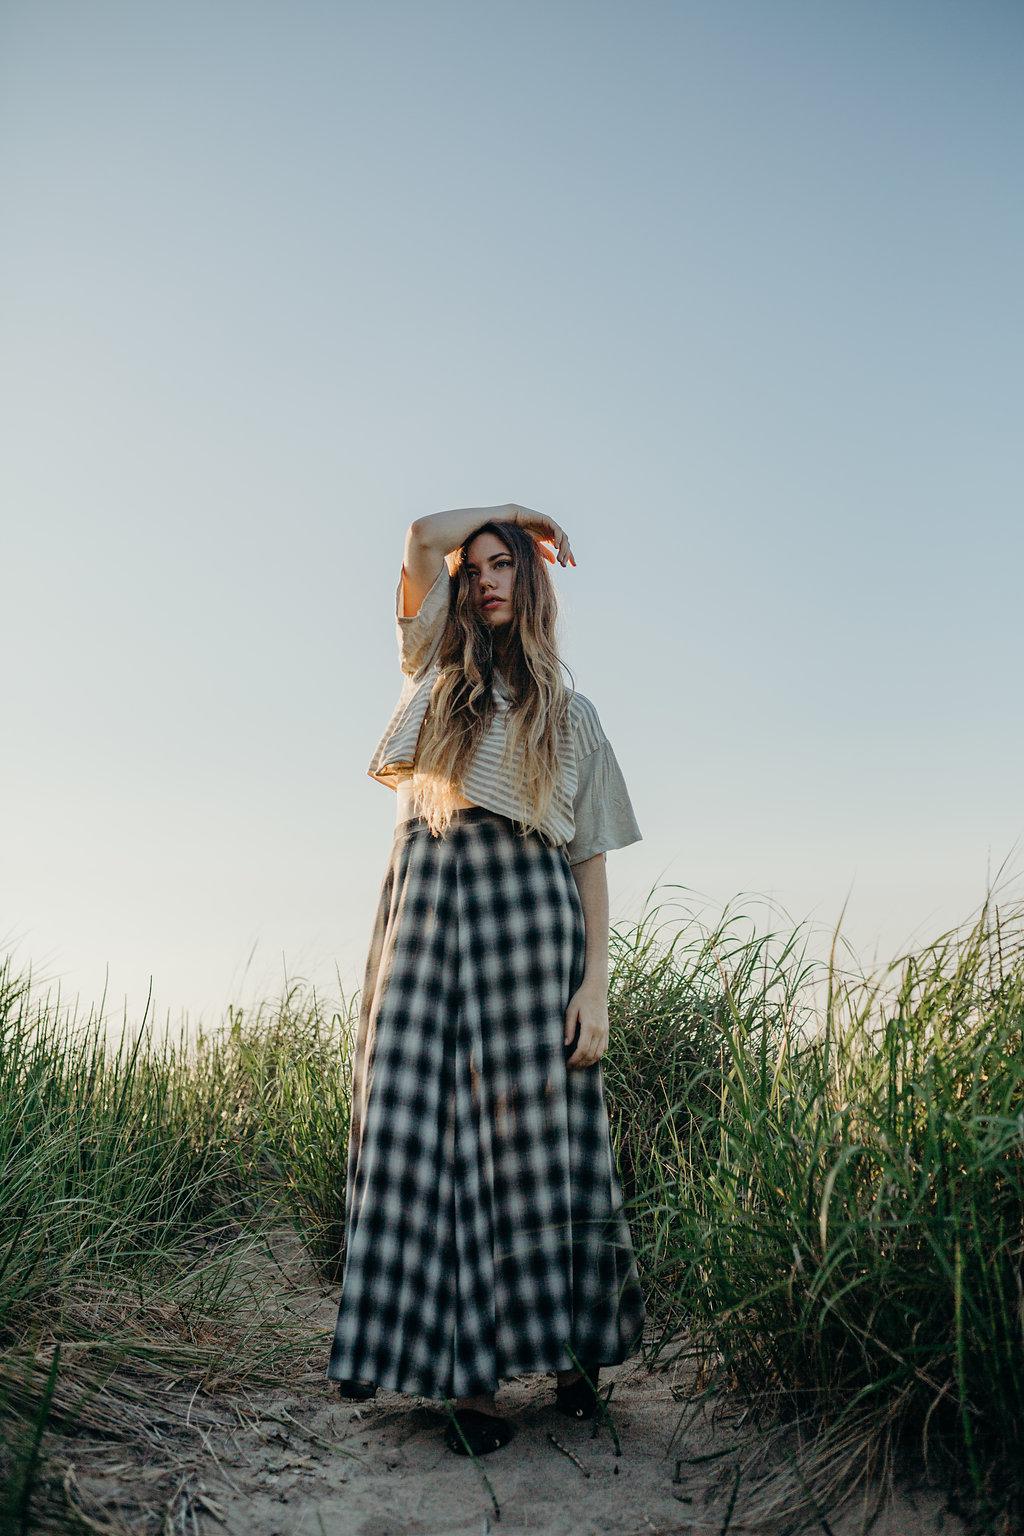 HEADLANDS BEACH OHIO | MAGAN 43